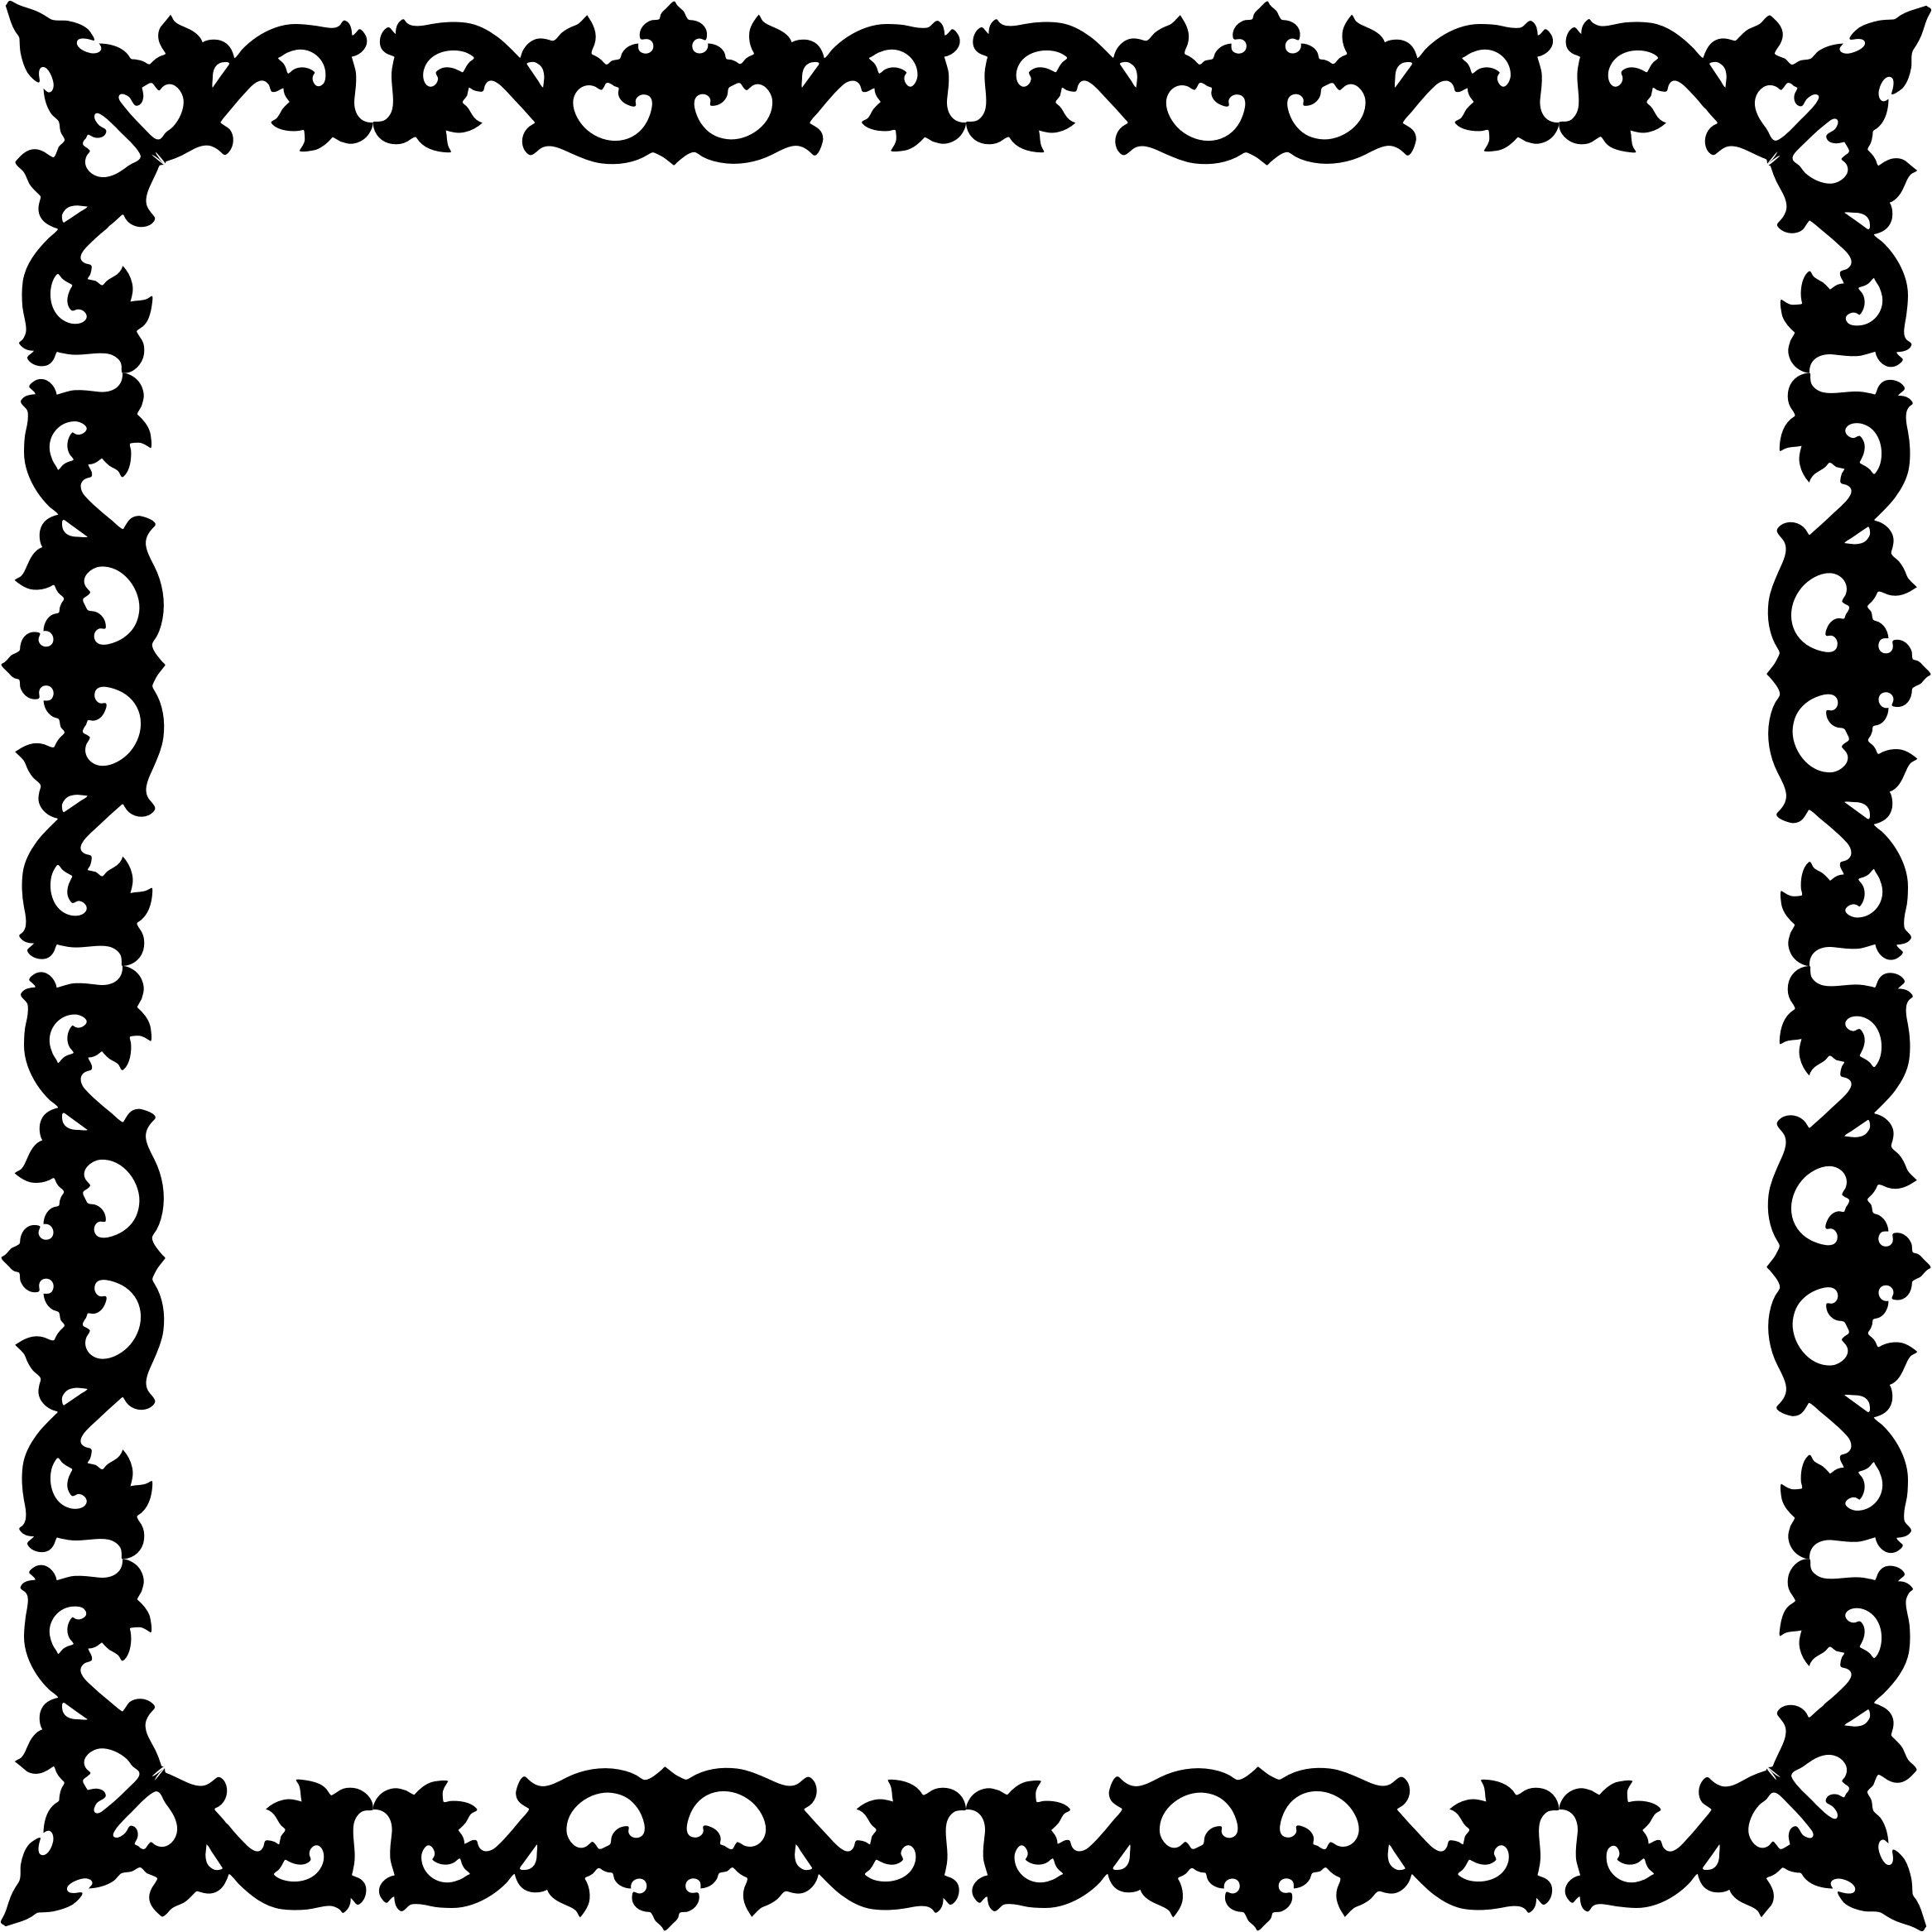 Clipart Decorative Flourish Silhouette Frame 3